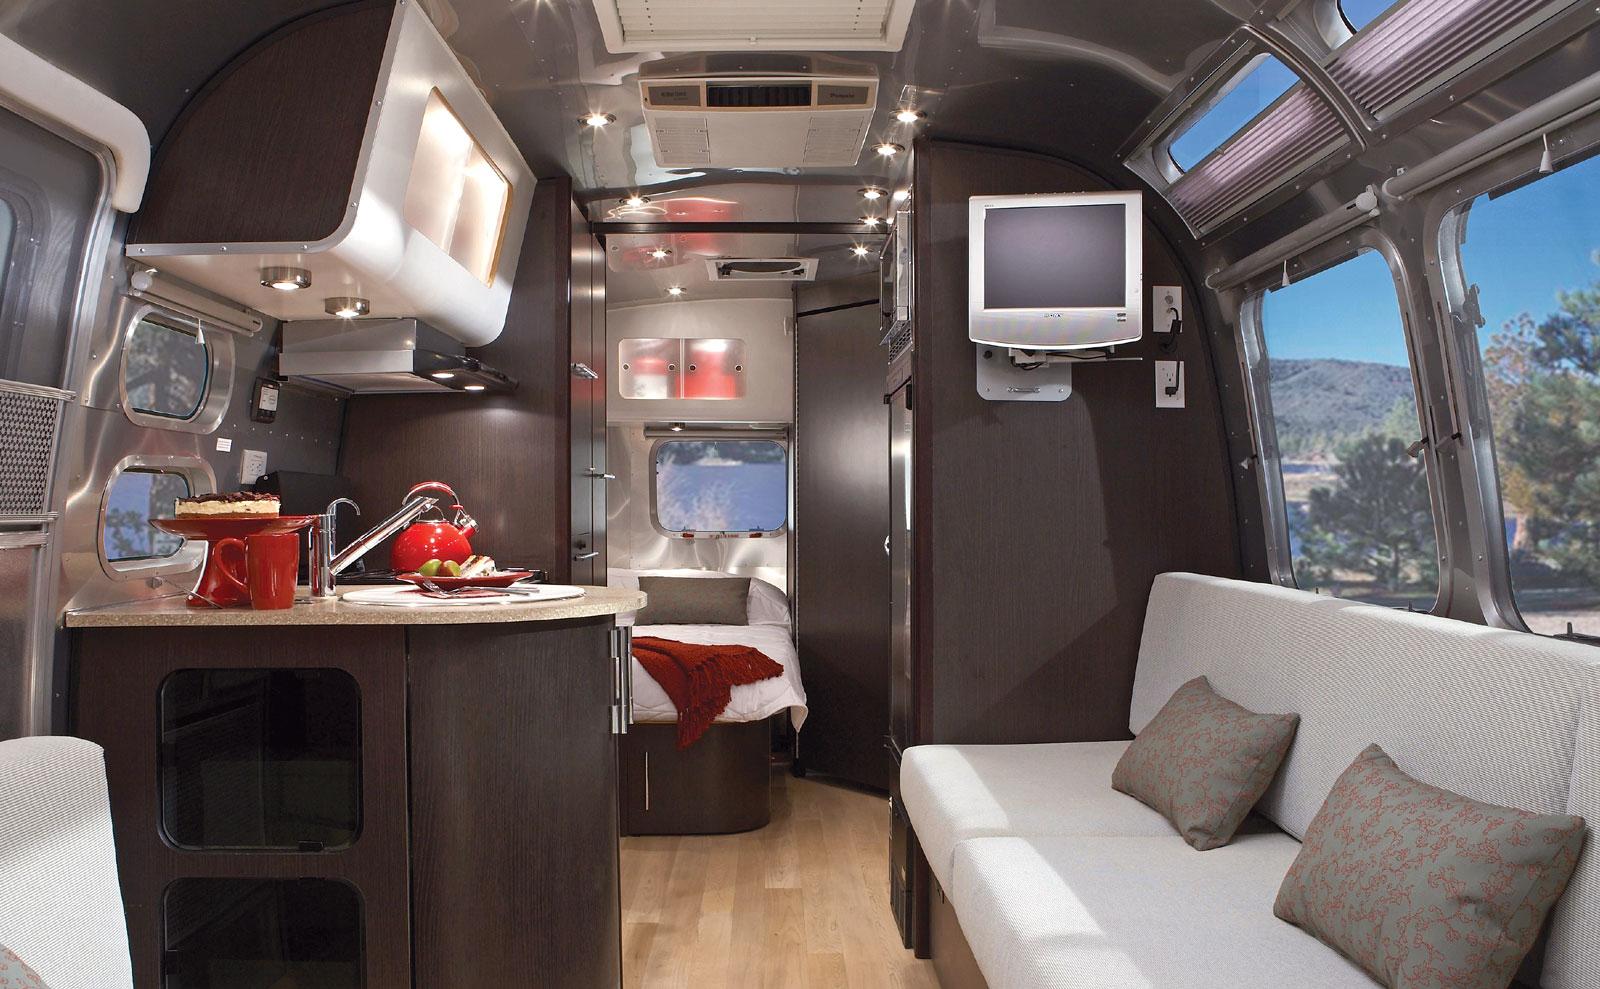 10 RV & Camper Van Remodel, Hacks Interior Decor Ideas